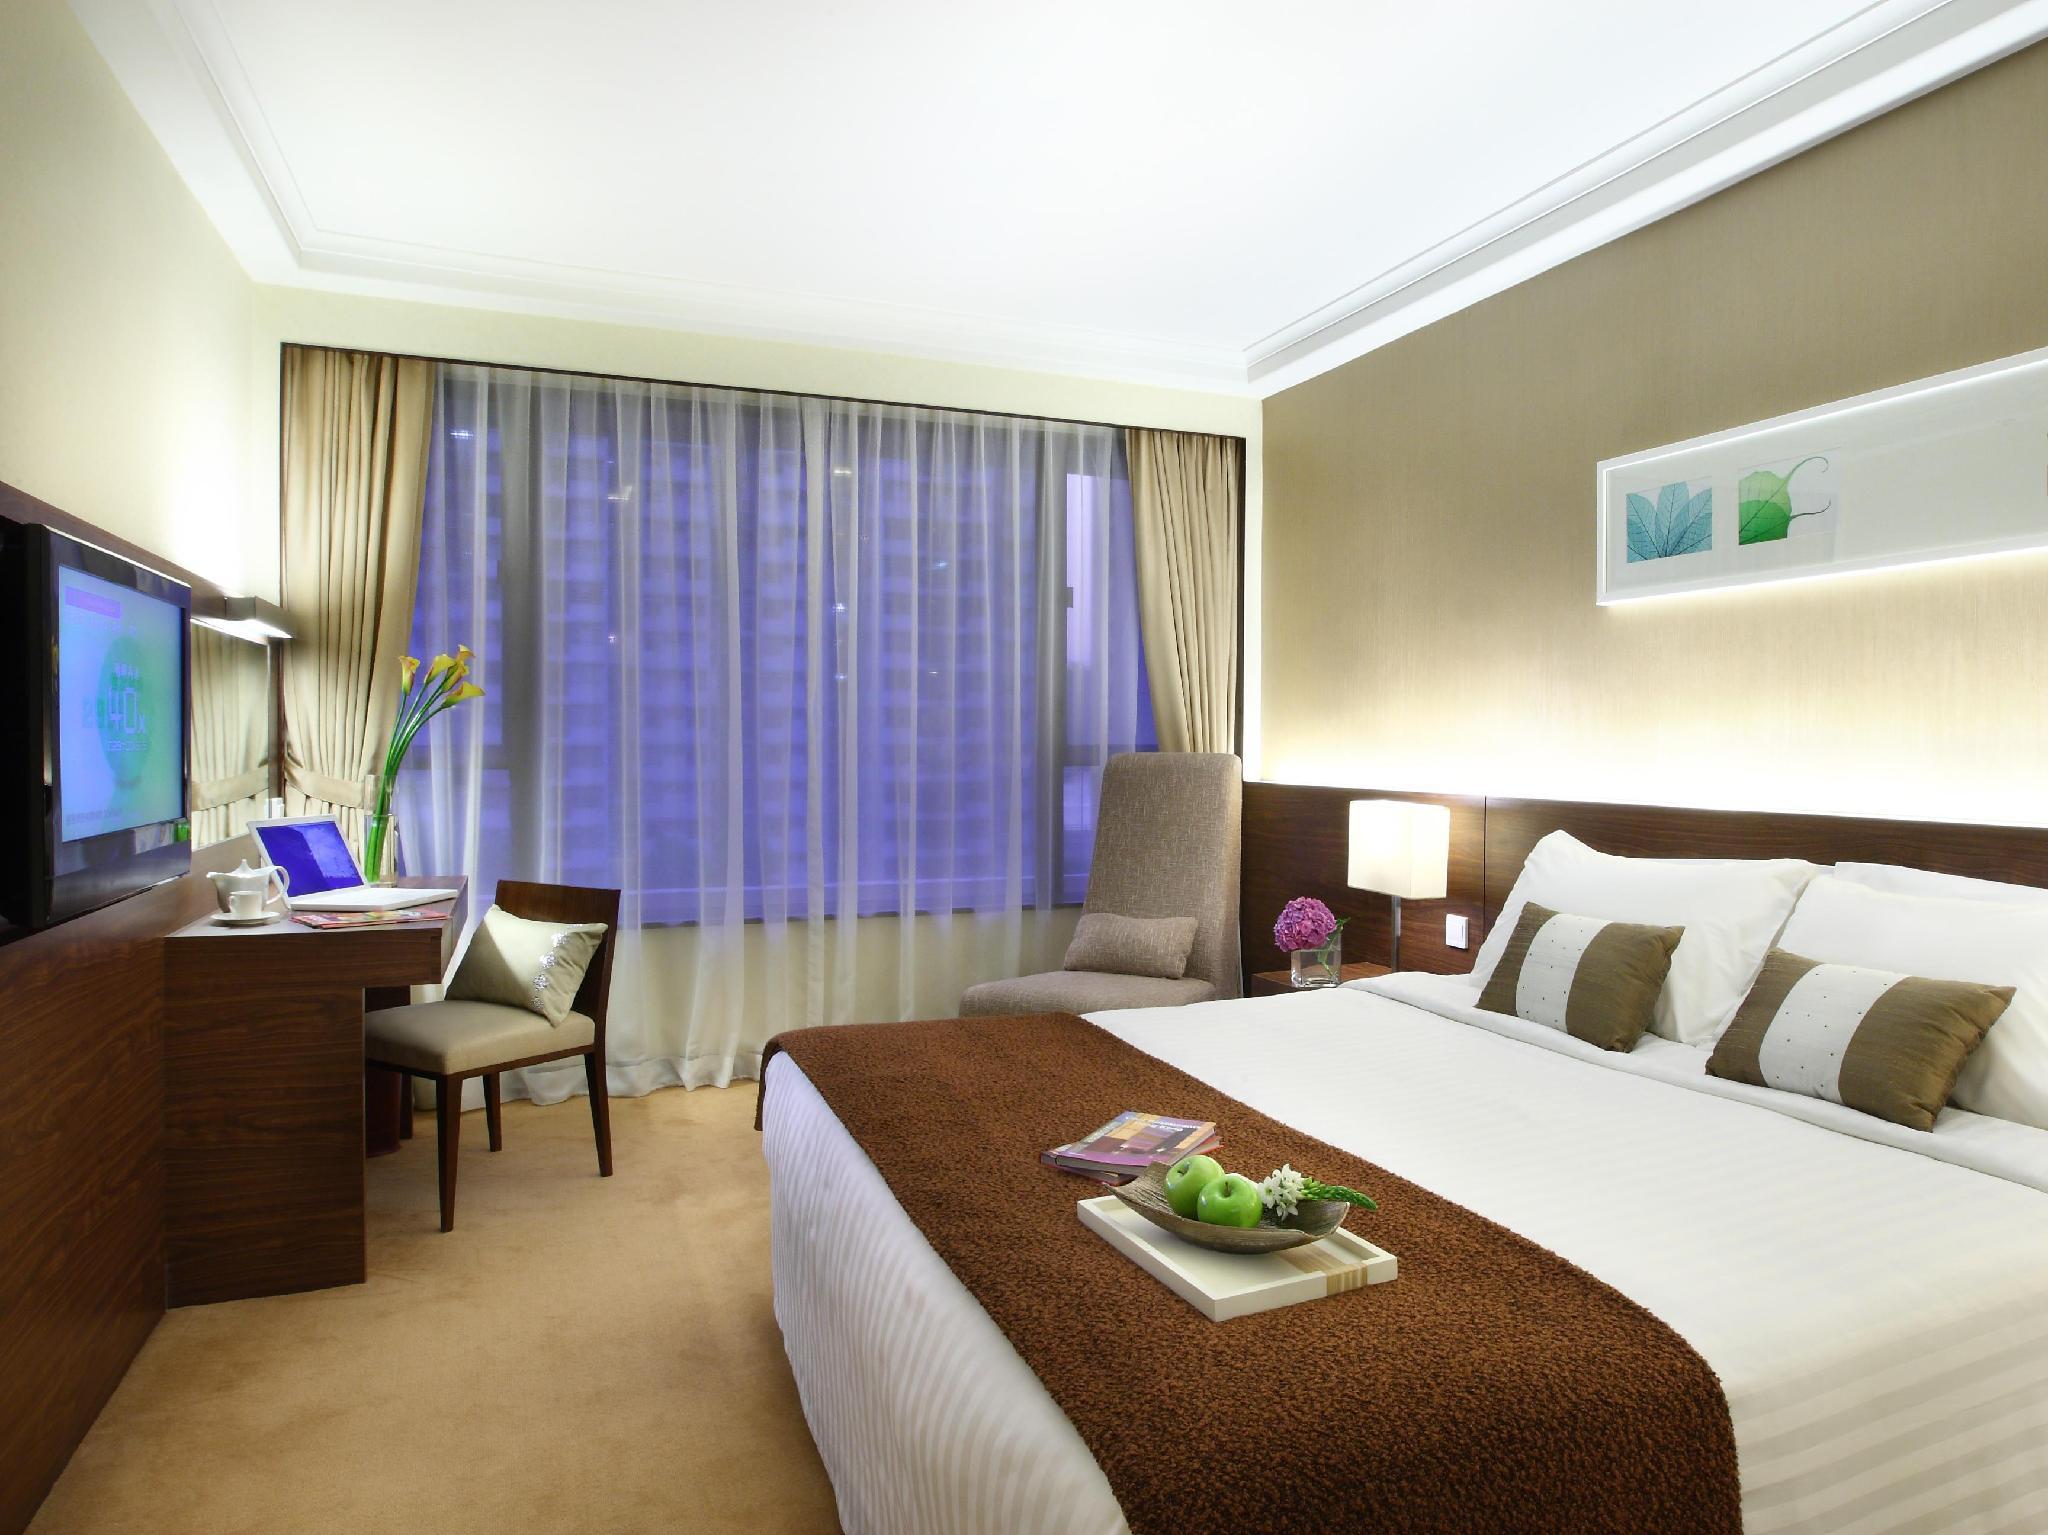 Attractive City Garden Hotel In Hong Kong   Room Deals, Photos U0026 Reviews Amazing Design